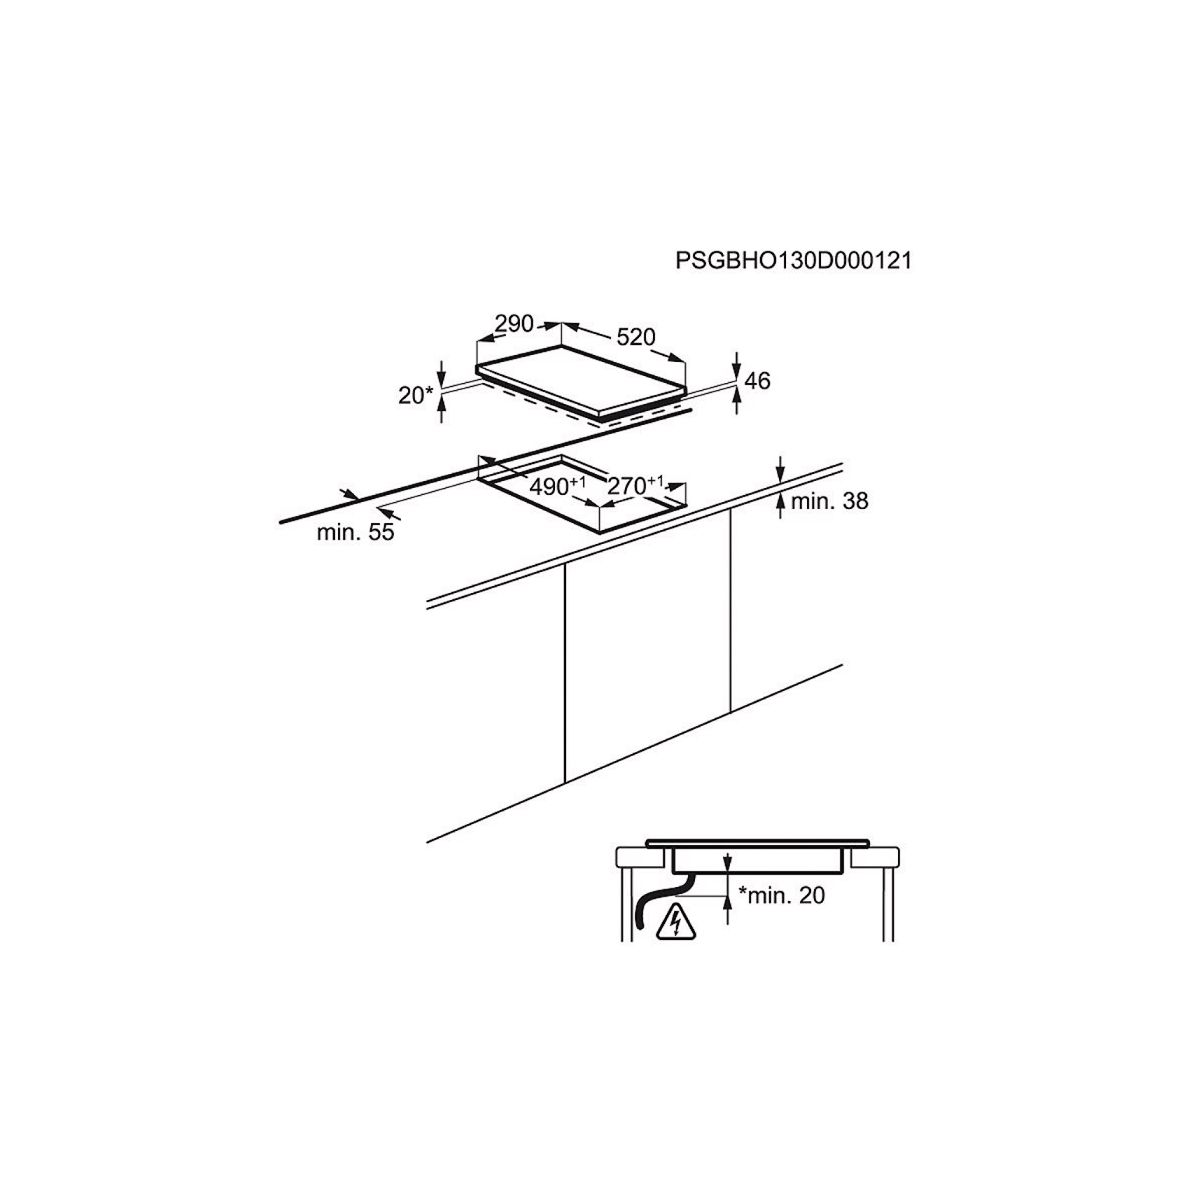 Table induction electrolux ehh3320nvk - livraison offerte : co...